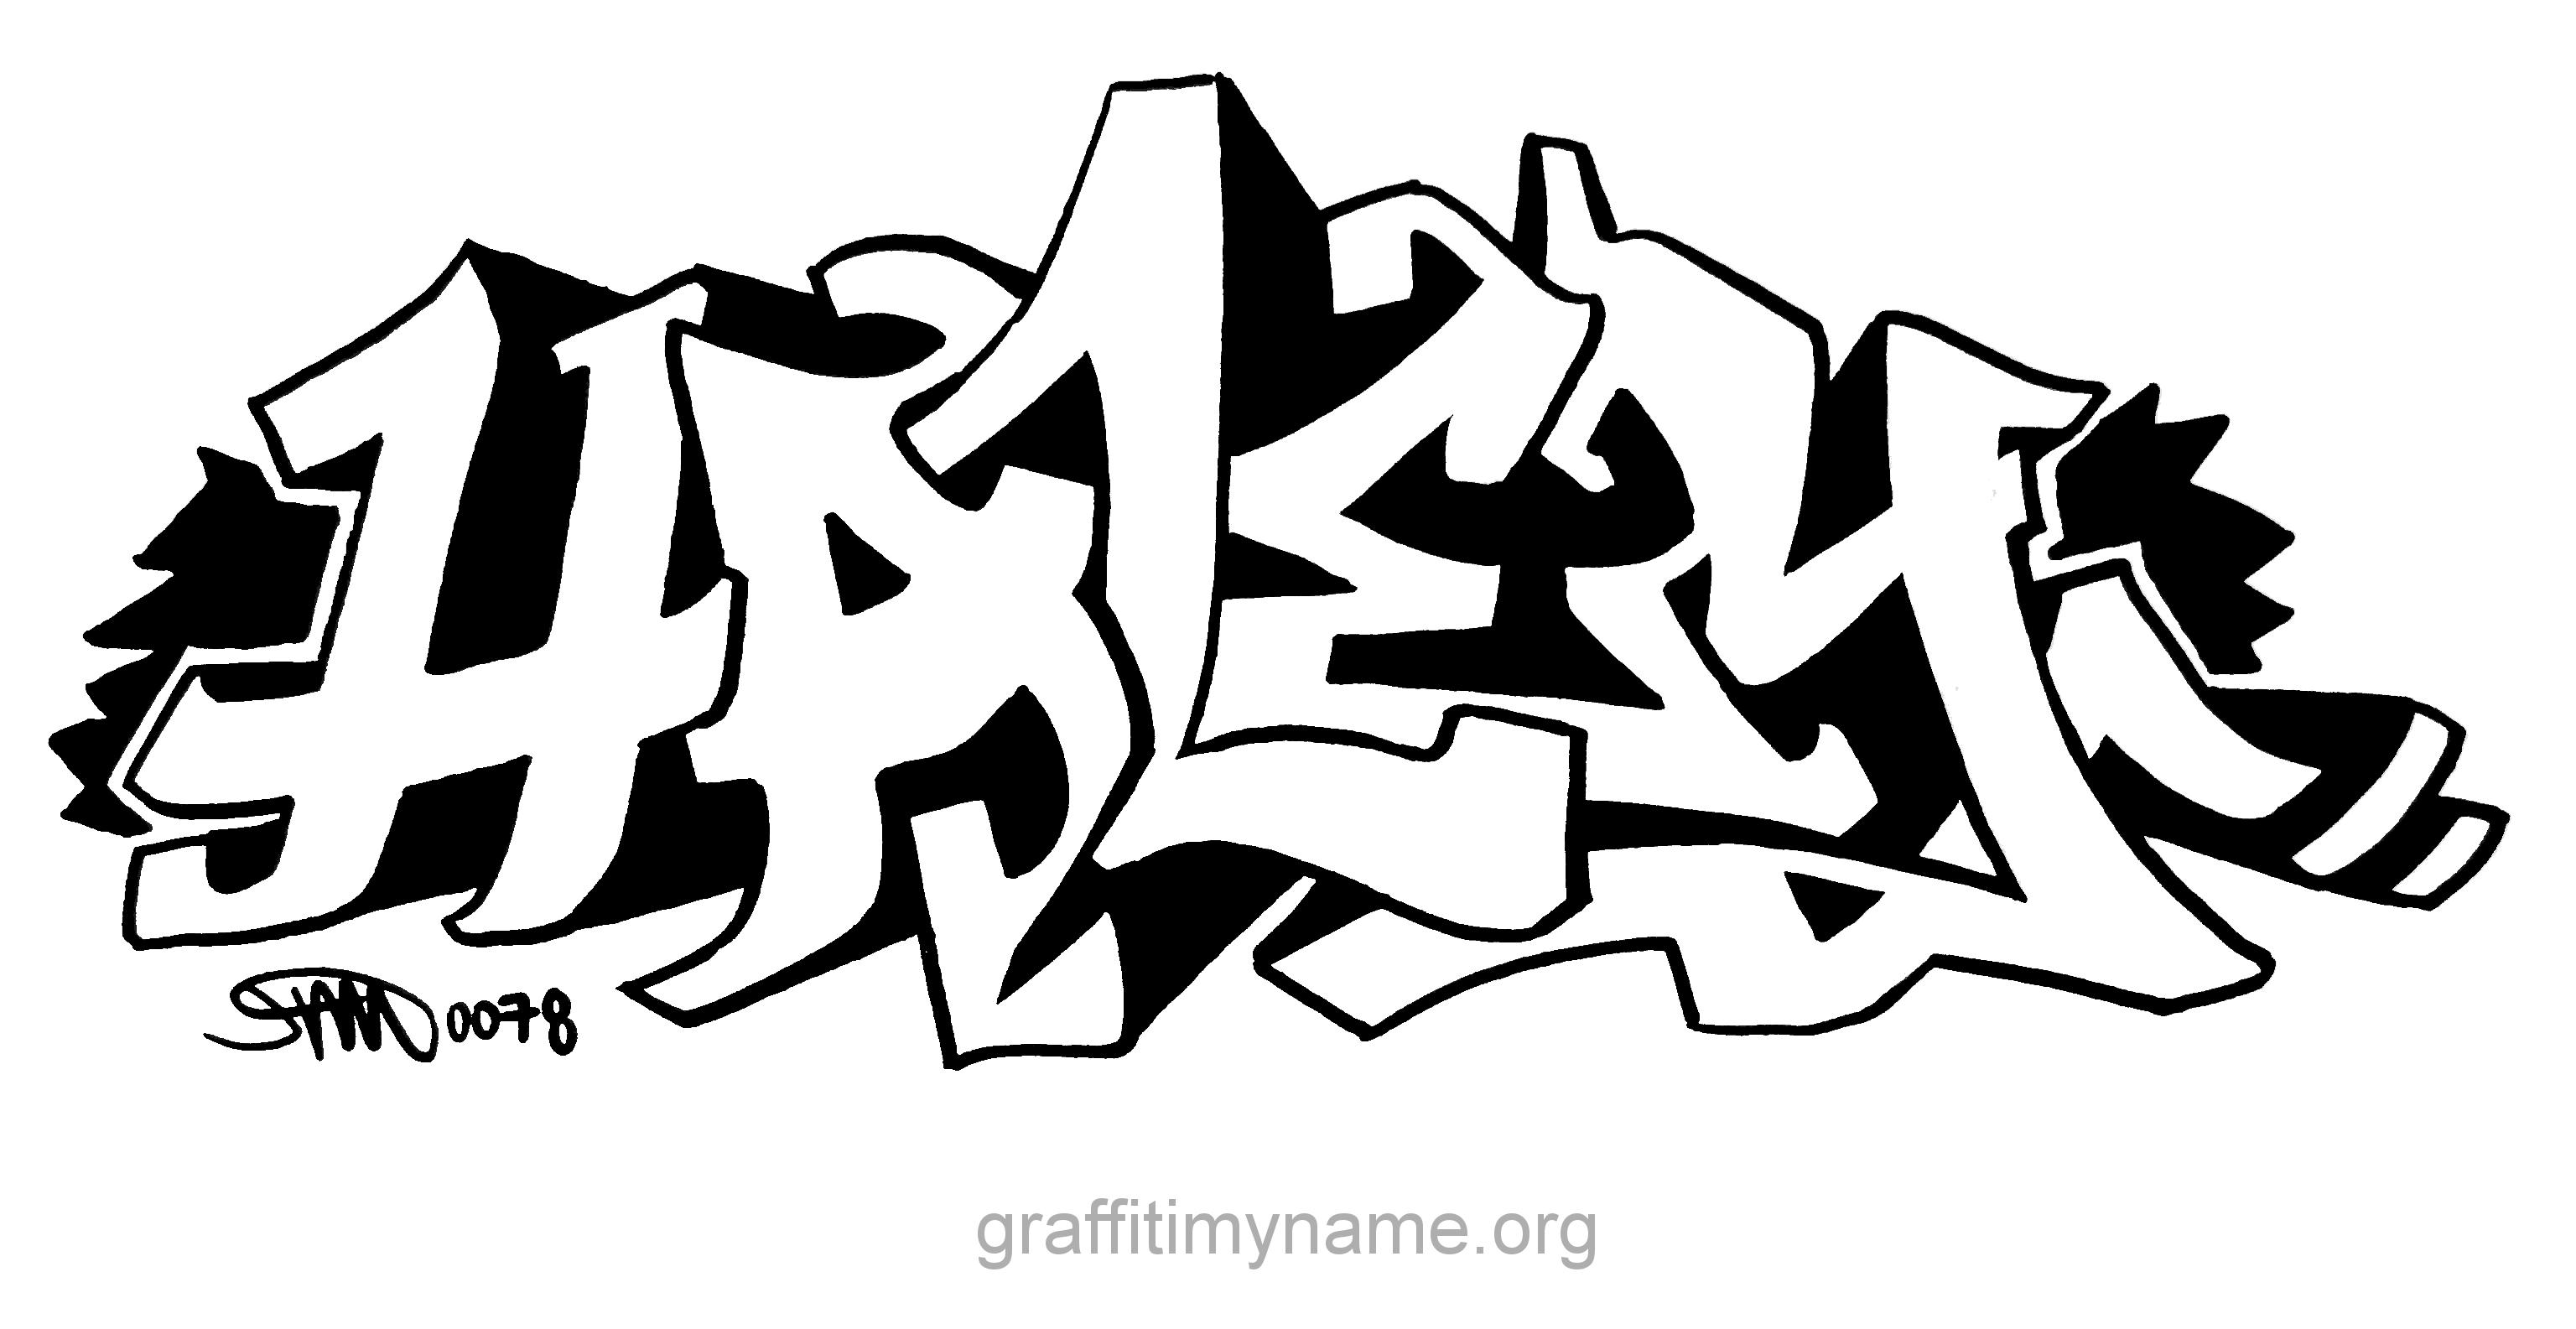 Haley Graffiti My Name